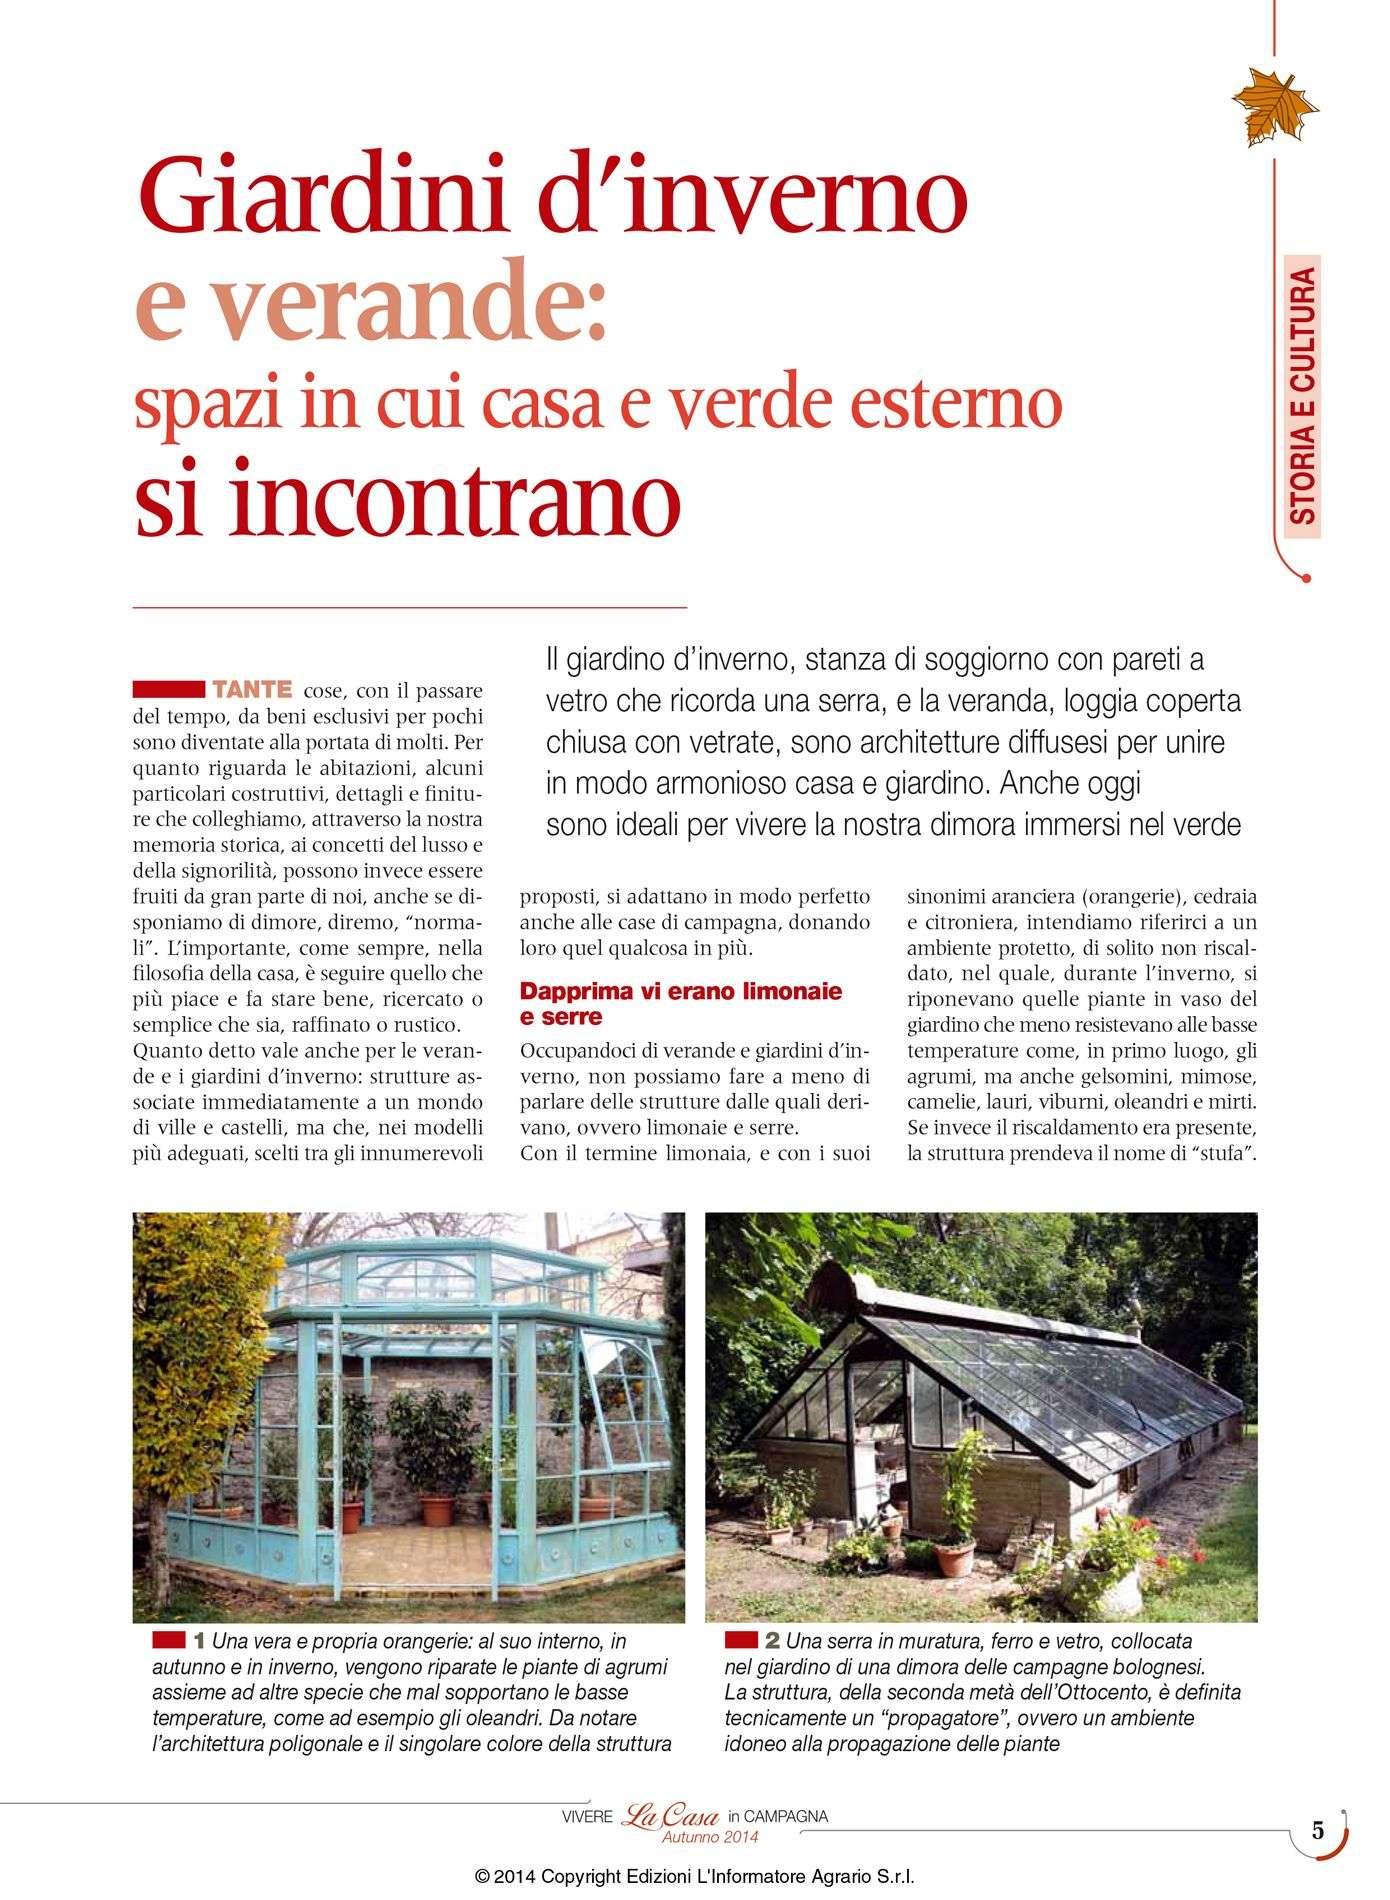 VERANDAS AND ORANGERIE Archivi - Garden House Lazzerini